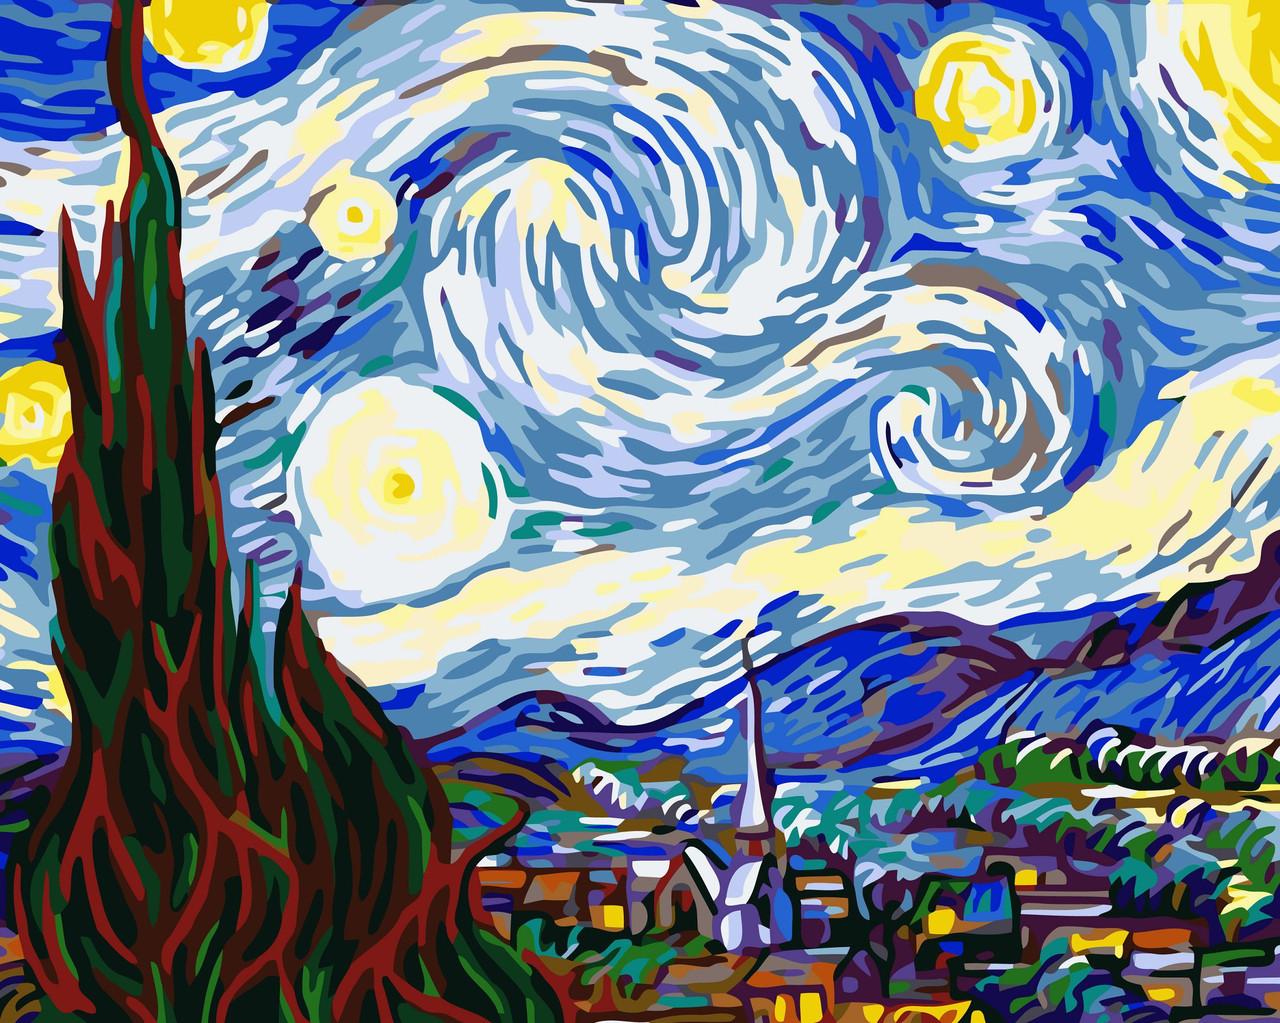 Картина по номерам Звездная ночь 40 х 50 см (KHO124)